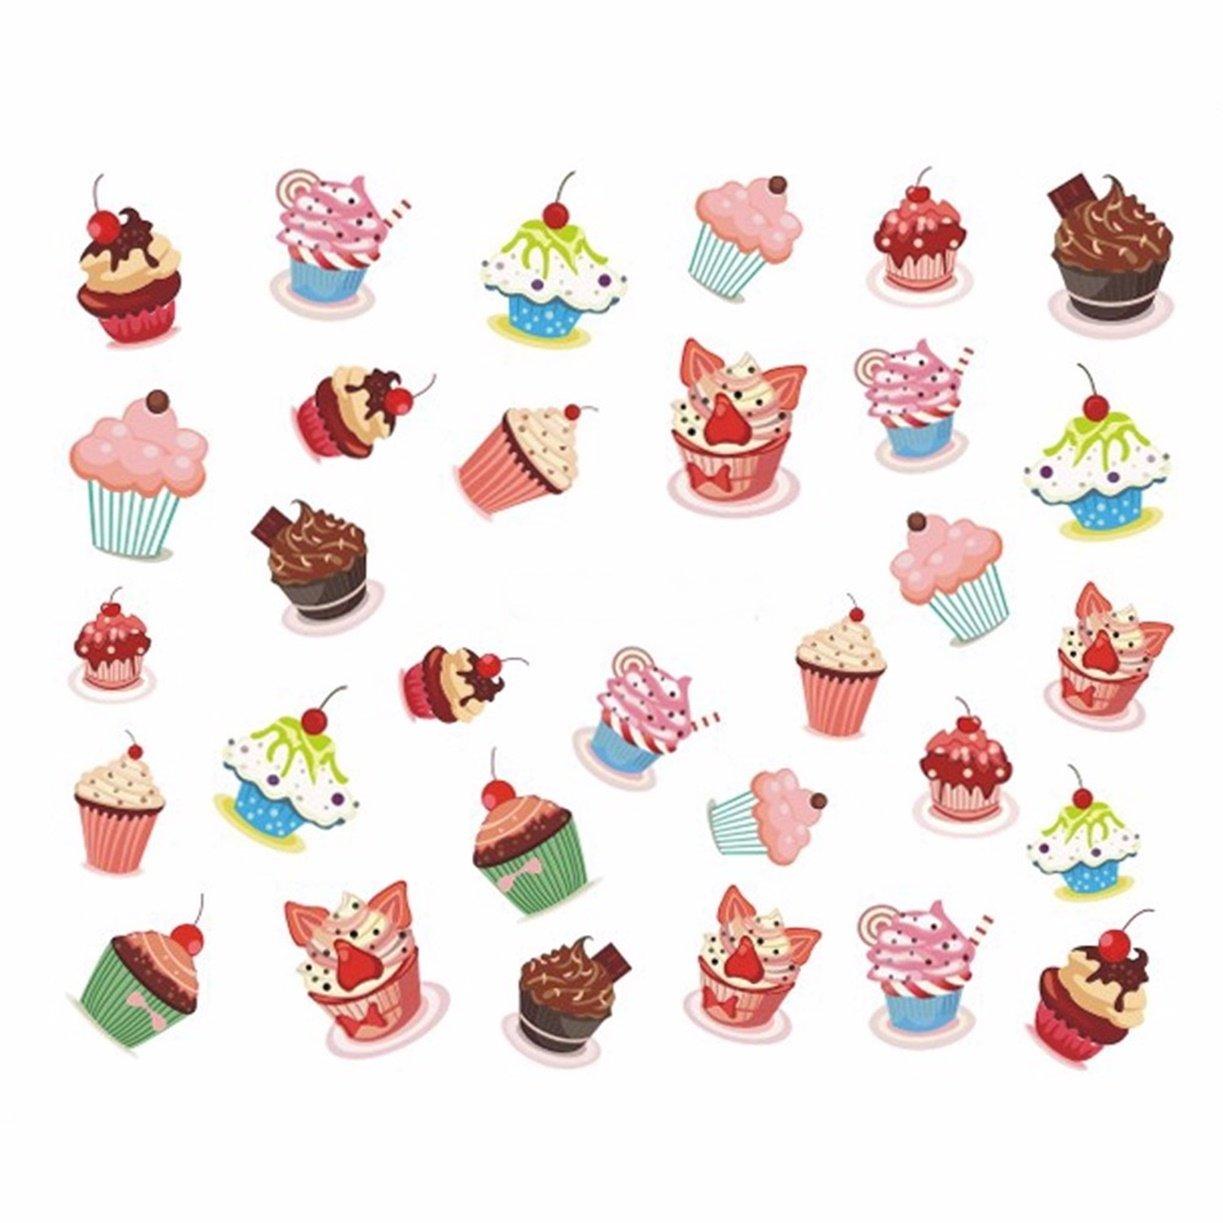 Amazon.com: 1 hoja de pegatinas para cupcakes, pasteles ...